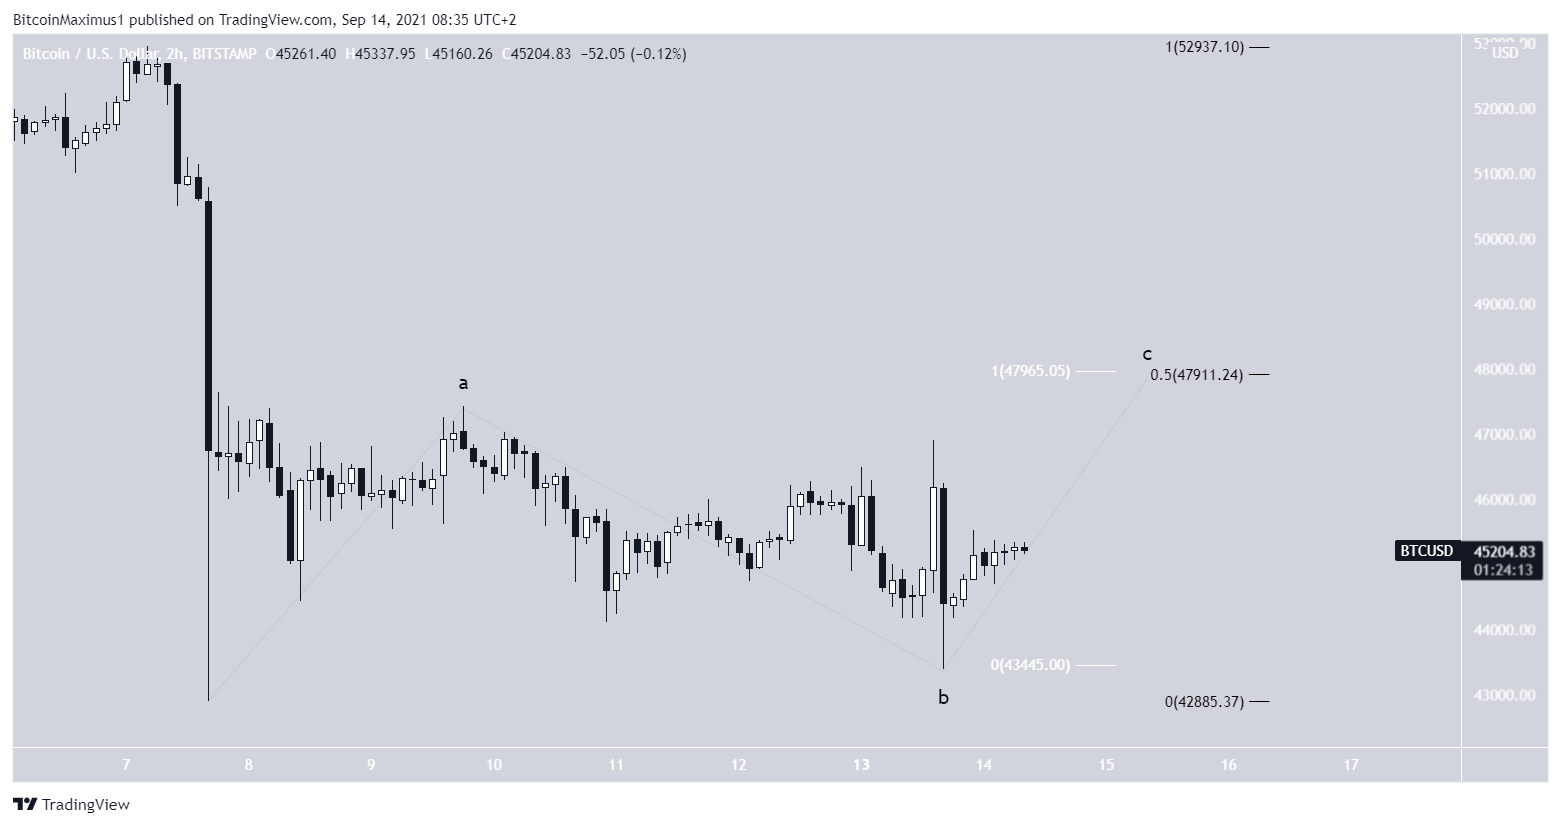 Bitcoin Kurs Preis Chart Wellenanalyse Prognose BTC